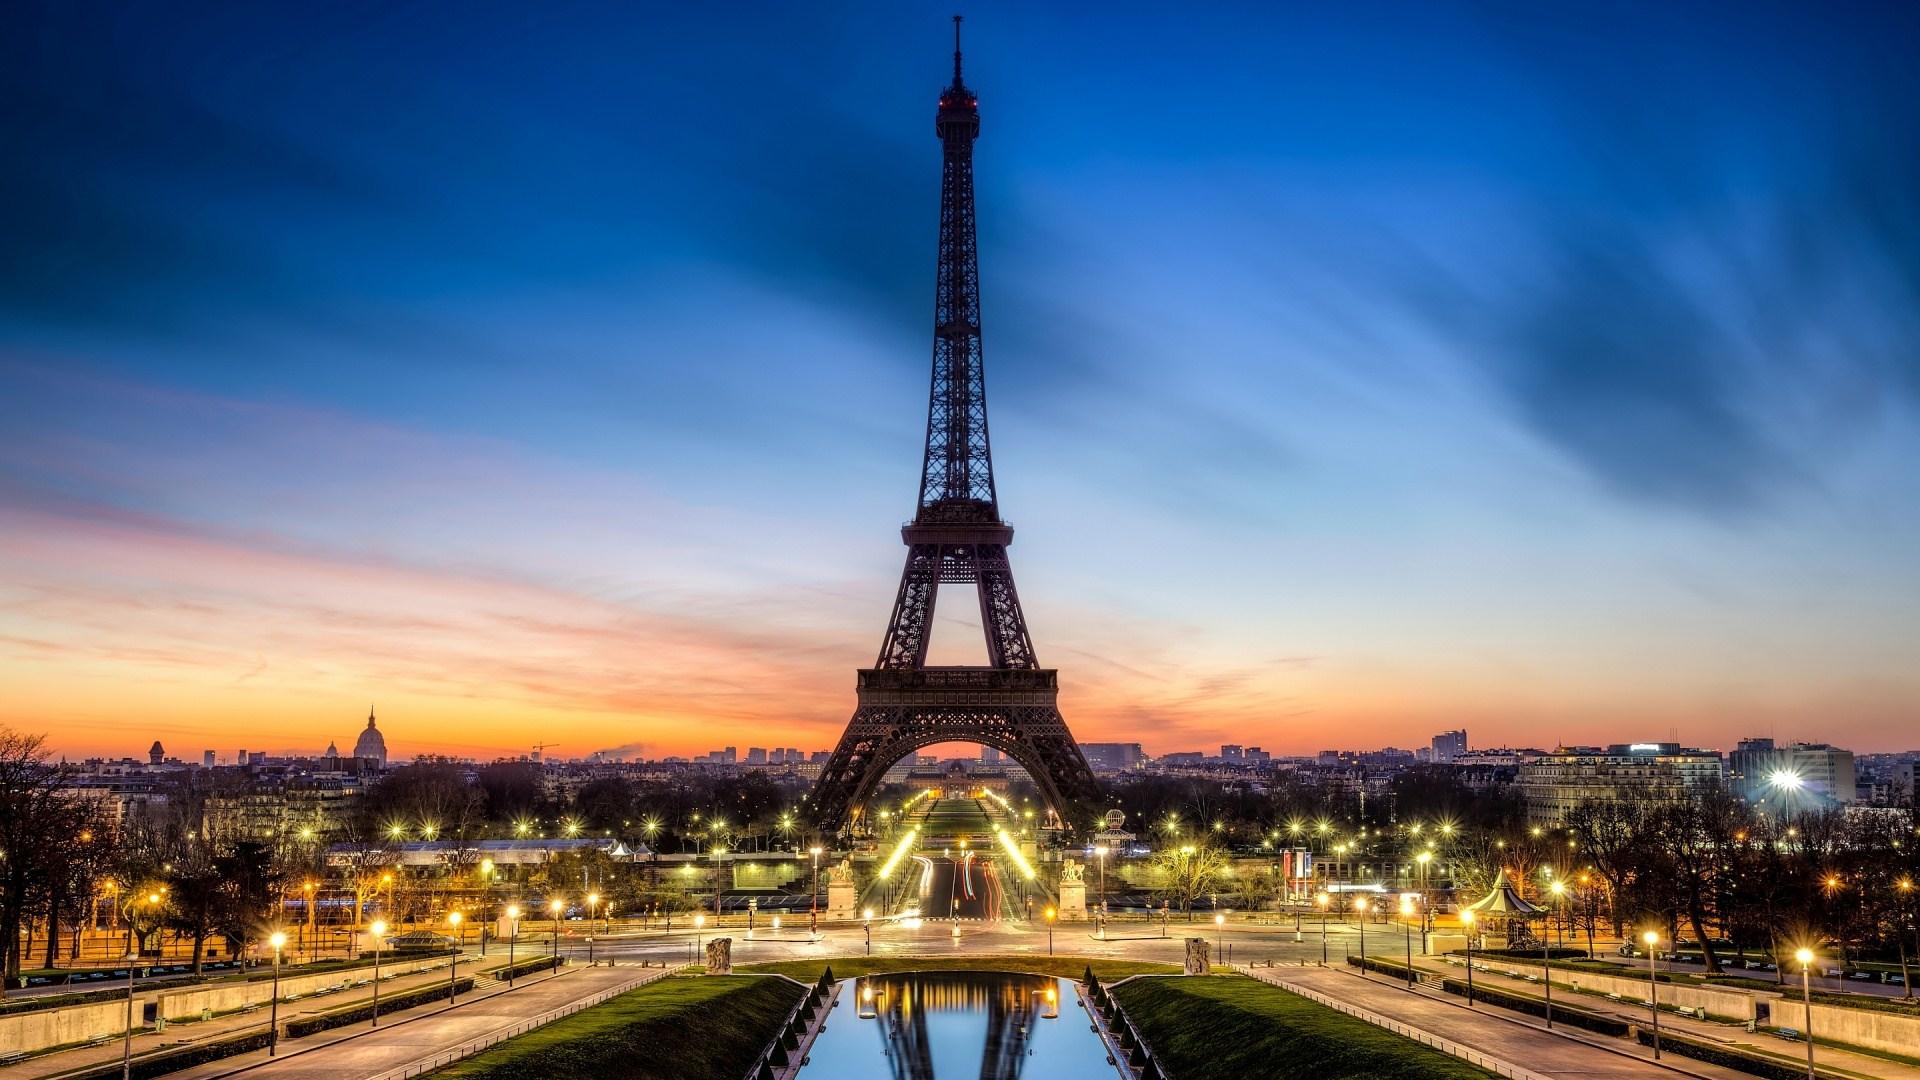 ... Eiffel Tower Wallpaper; Eiffel Tower Wallpaper